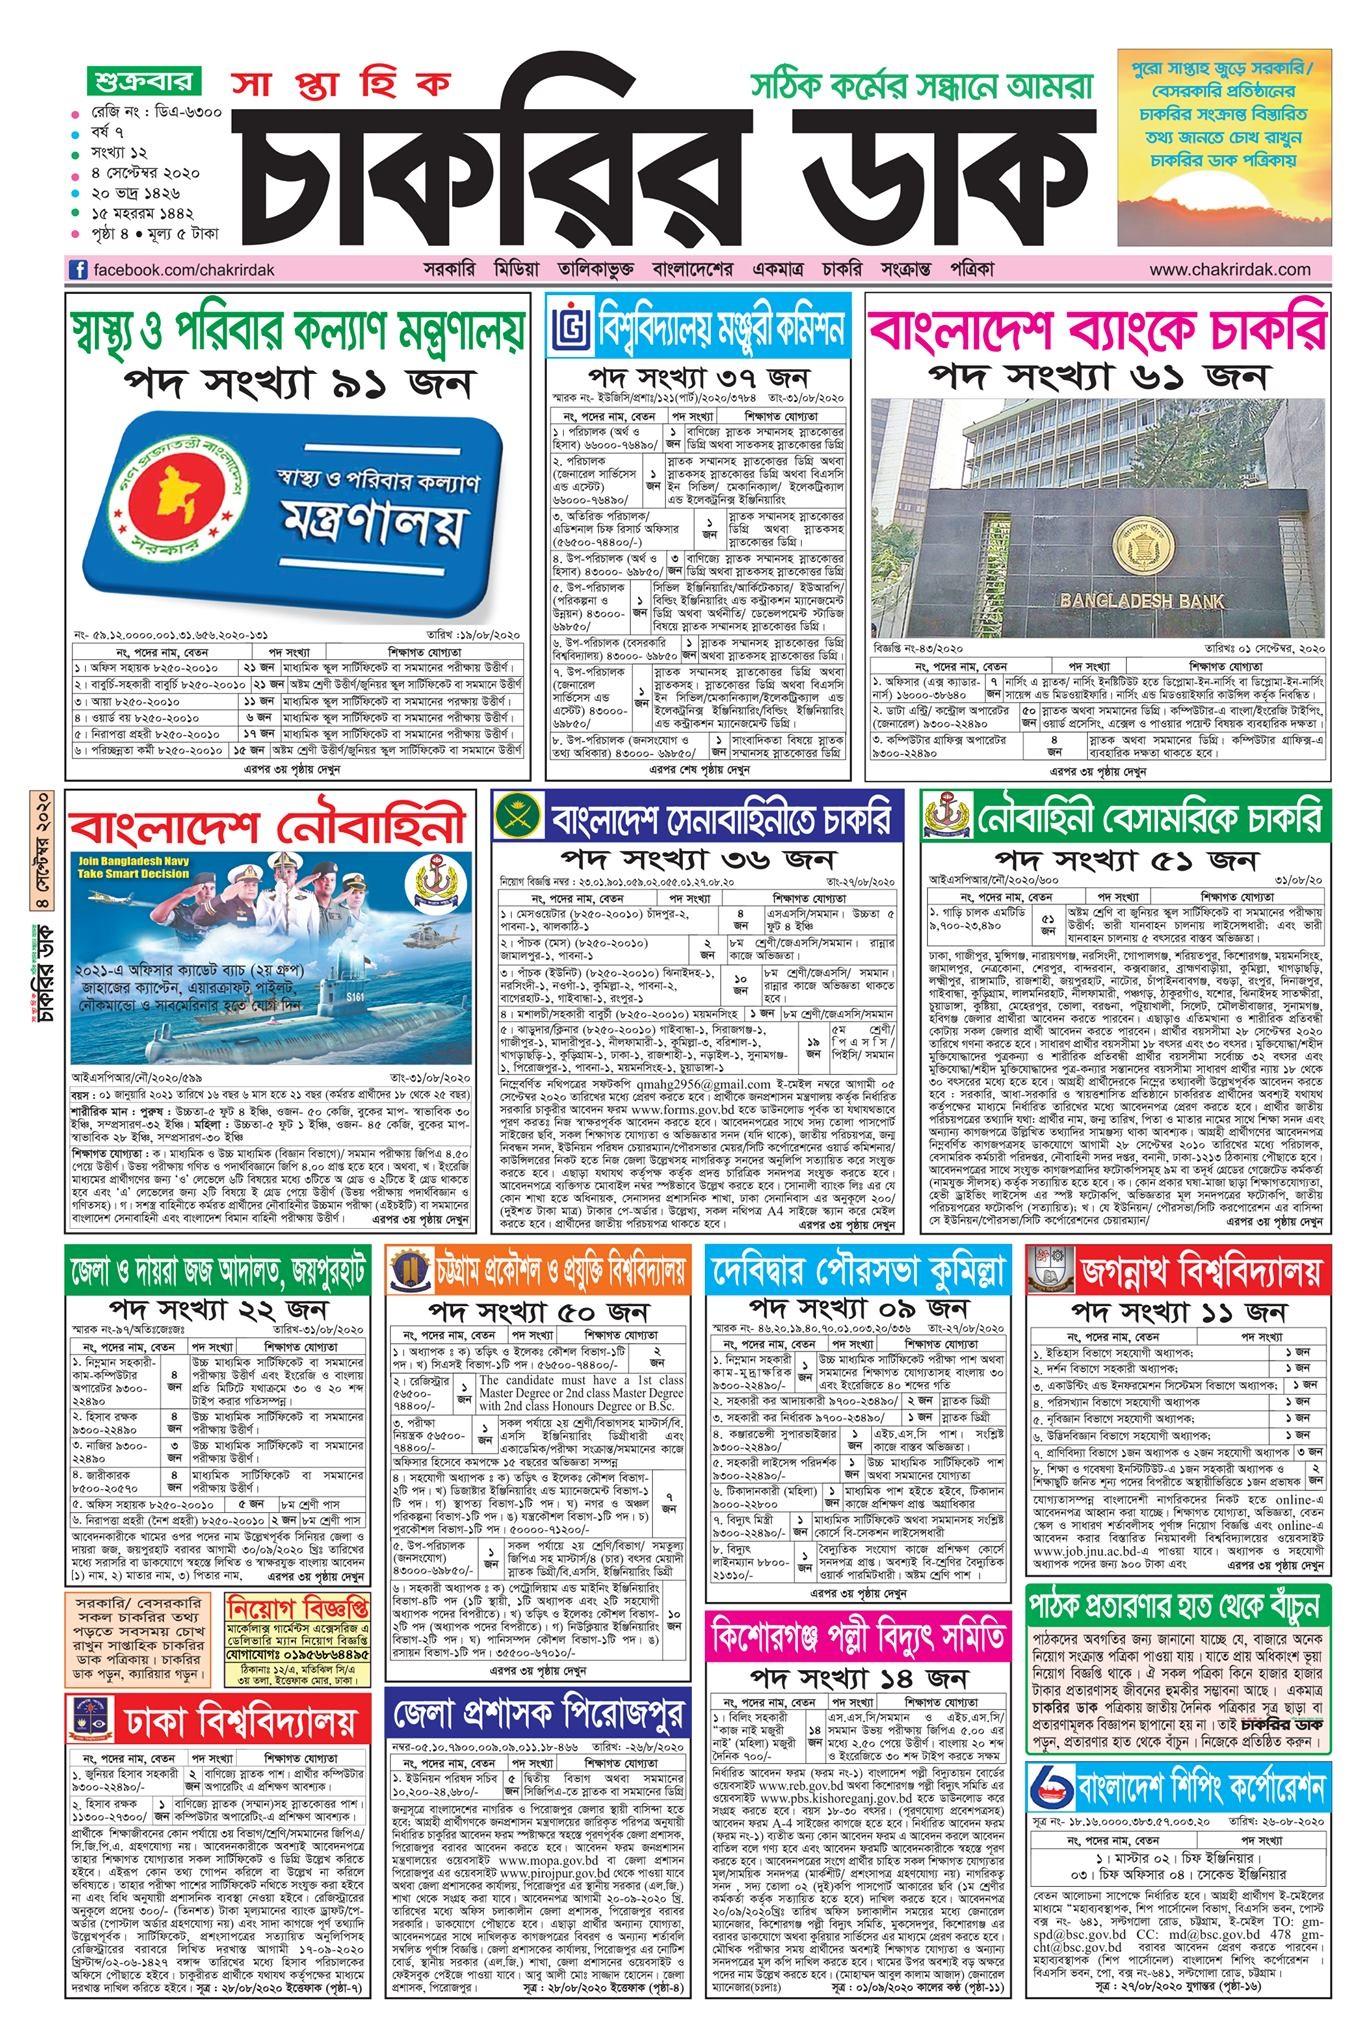 chakrir-dak-weekly-jobs-newspaper-4-september-2020